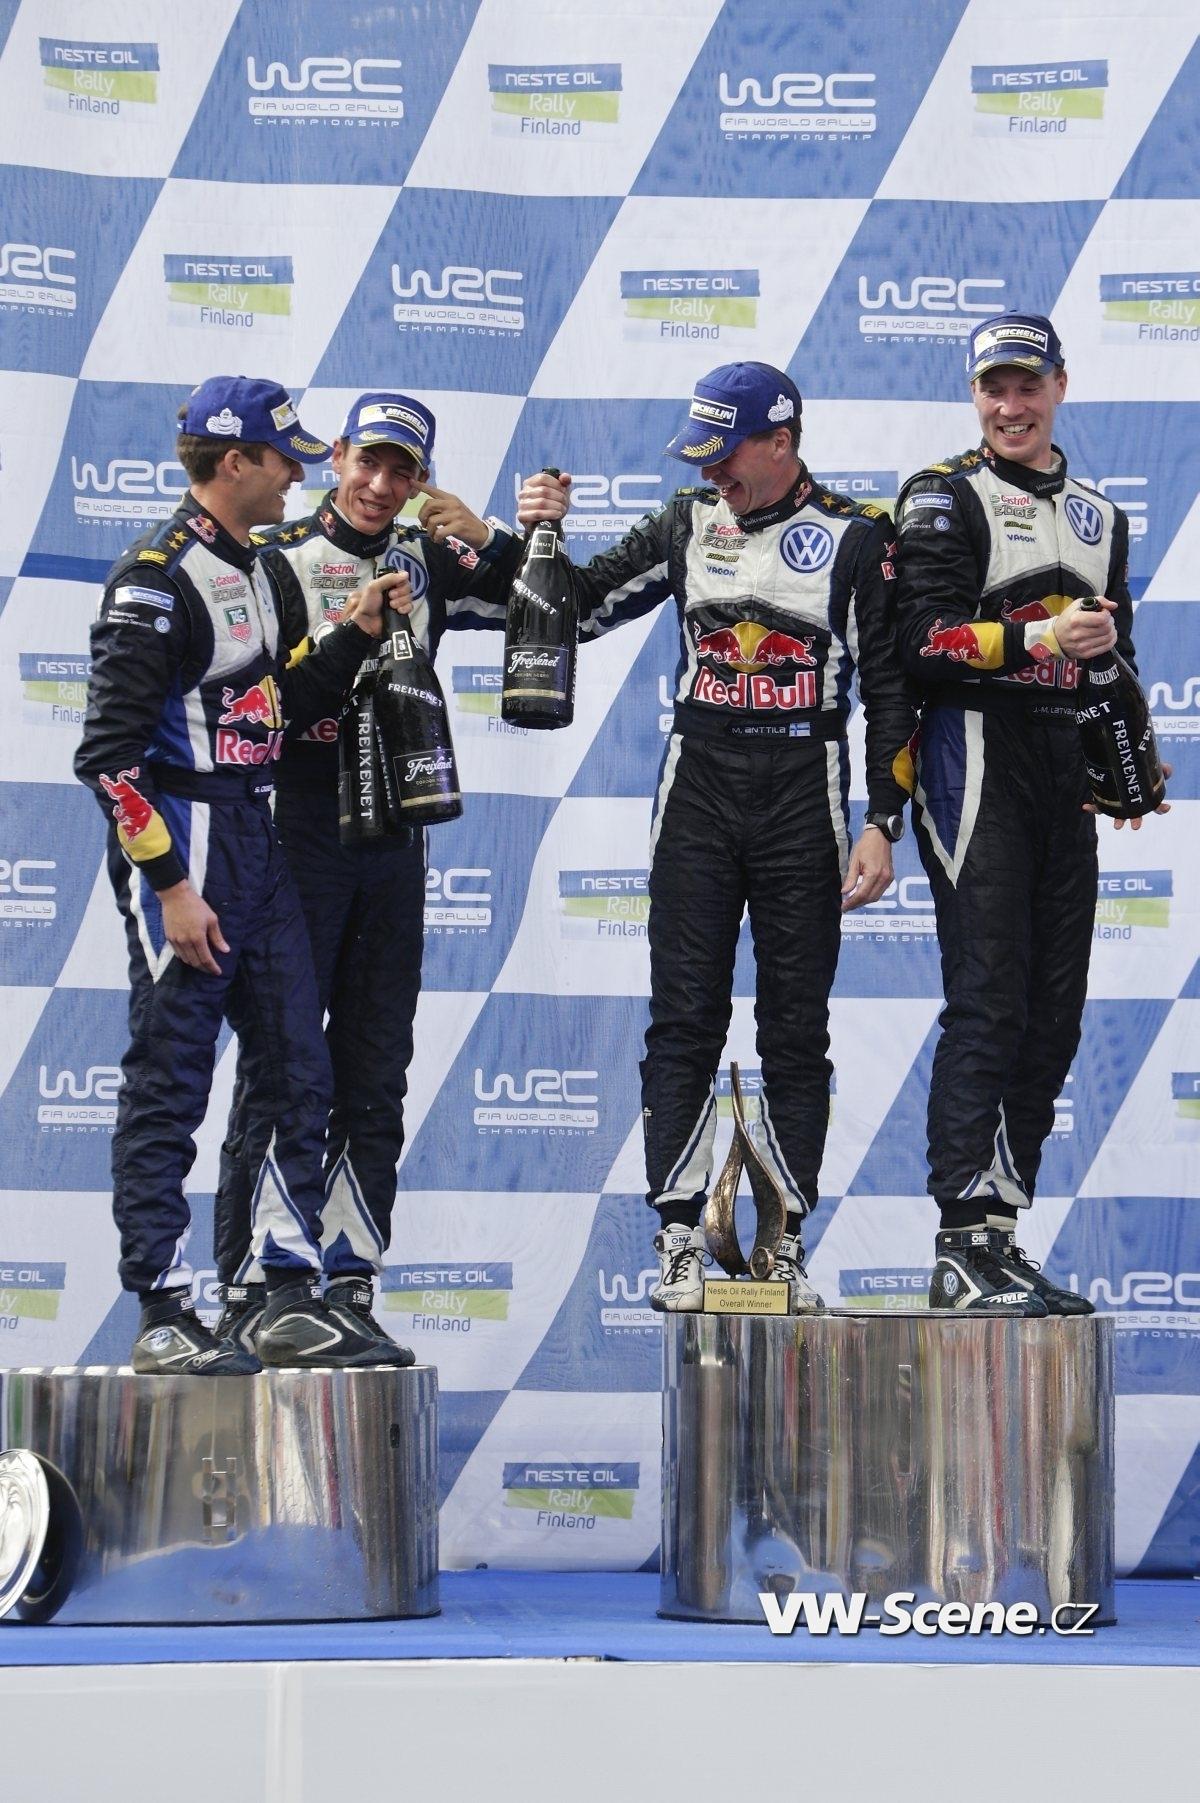 Sébastien Ogier (F), Julien Ingrassia (F), Miikka Anttila (FIN), Jari-Matti Latvala (FIN) WRC Rally Finland 2015